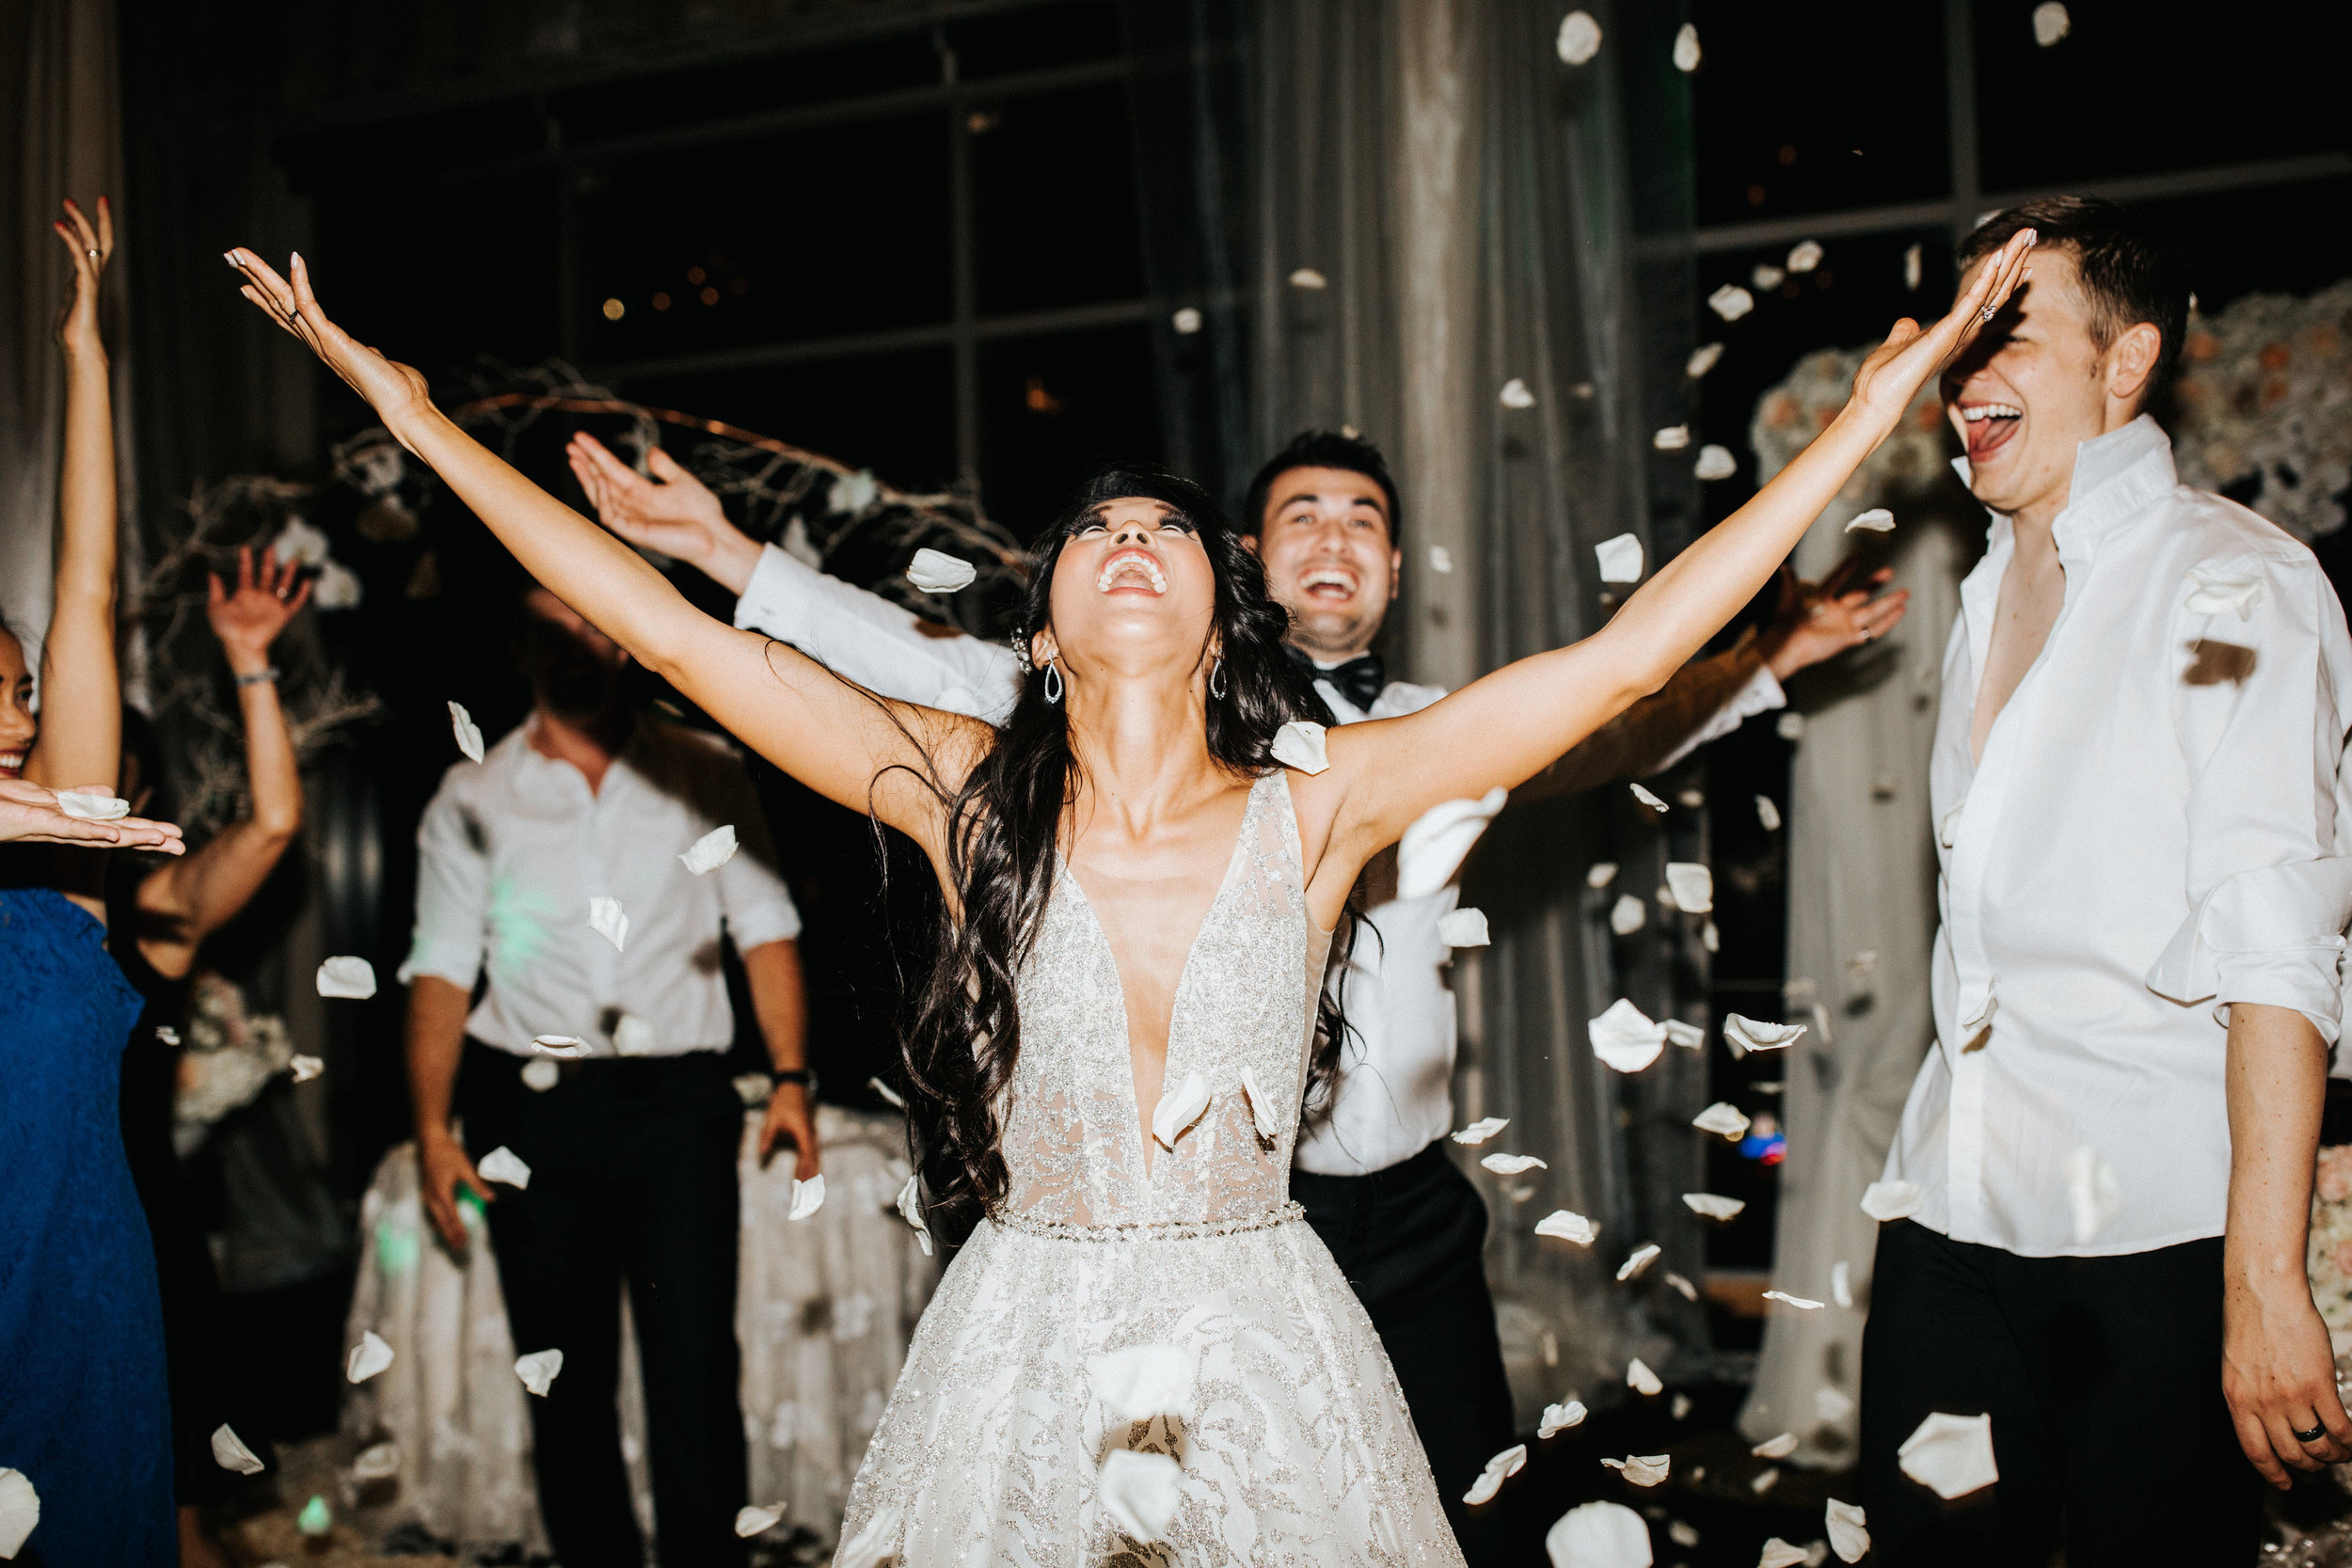 Bridalbliss.com   Seattle Wedding   Washington Event Coordination and Design   Wiley Putnum